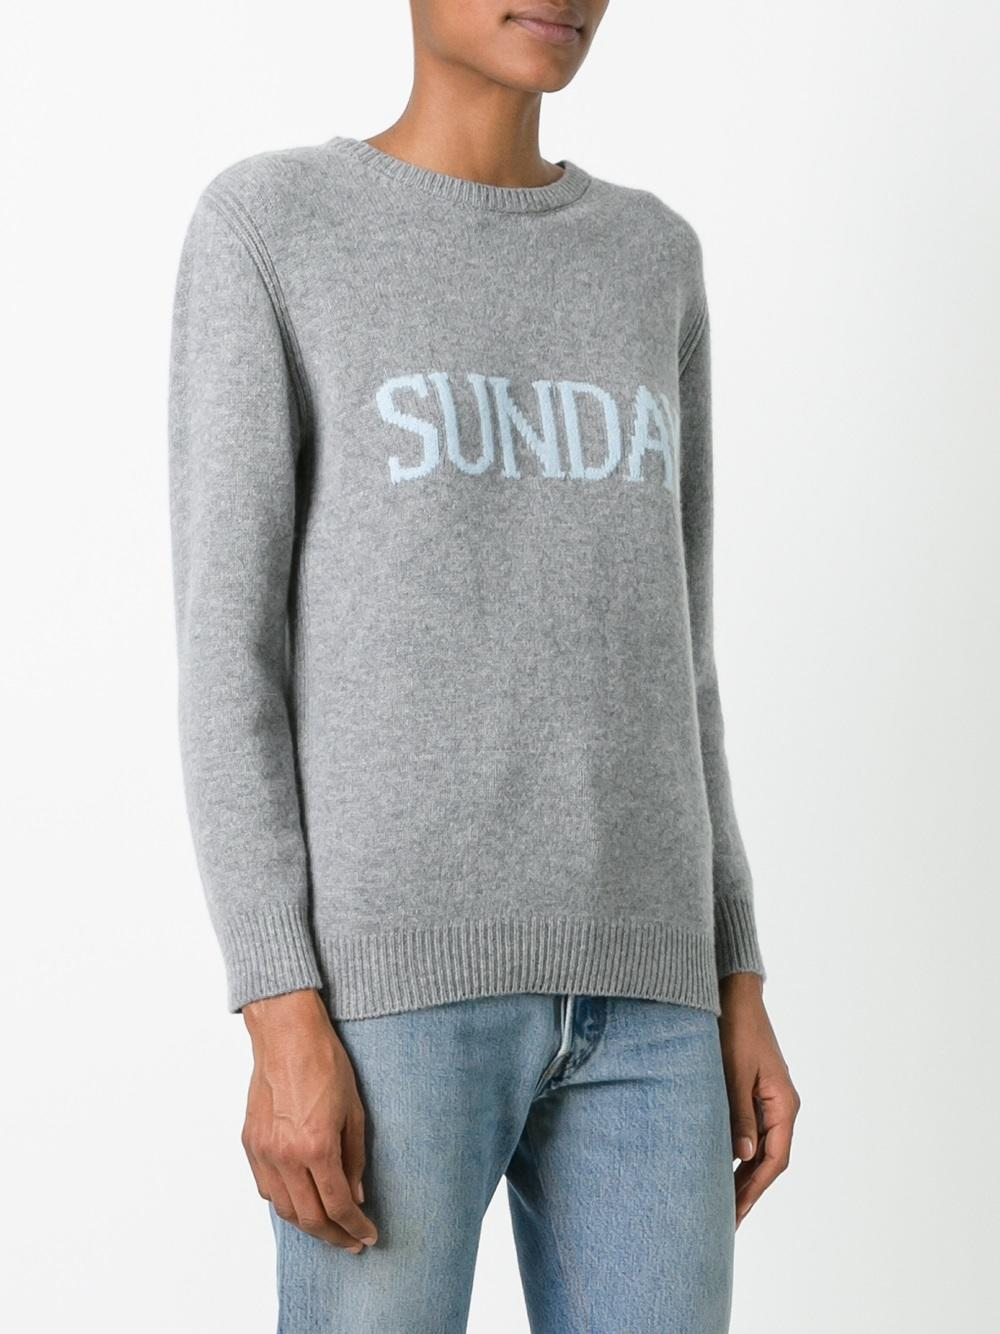 Alberta Ferretti Cashmere Sunday Jumper in Grey (Grey)